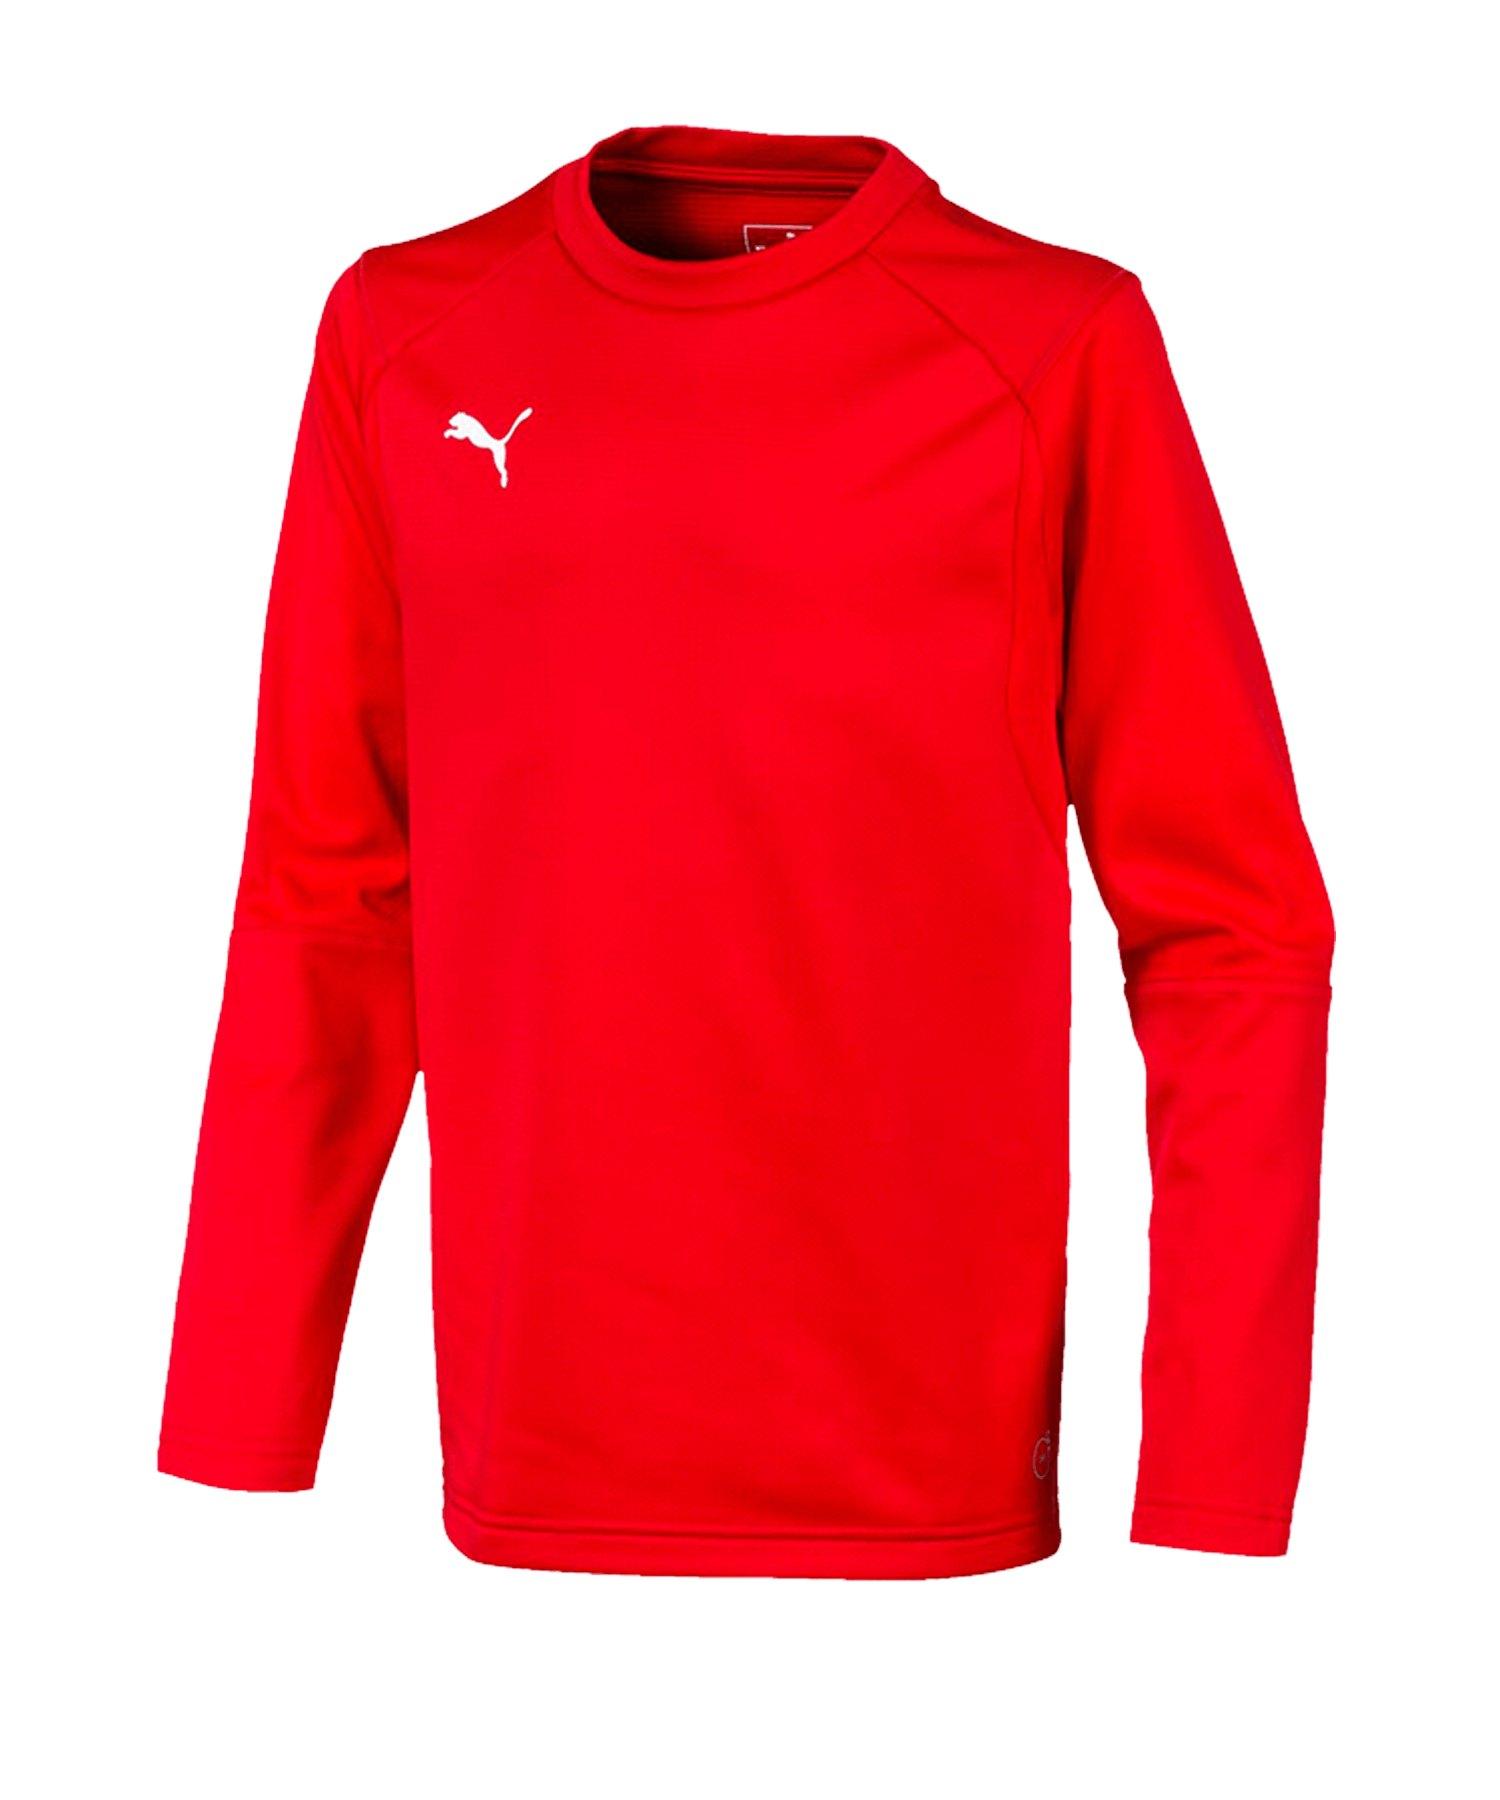 PUMA LIGA Training Sweatshirt Kids Rot F01 - rot